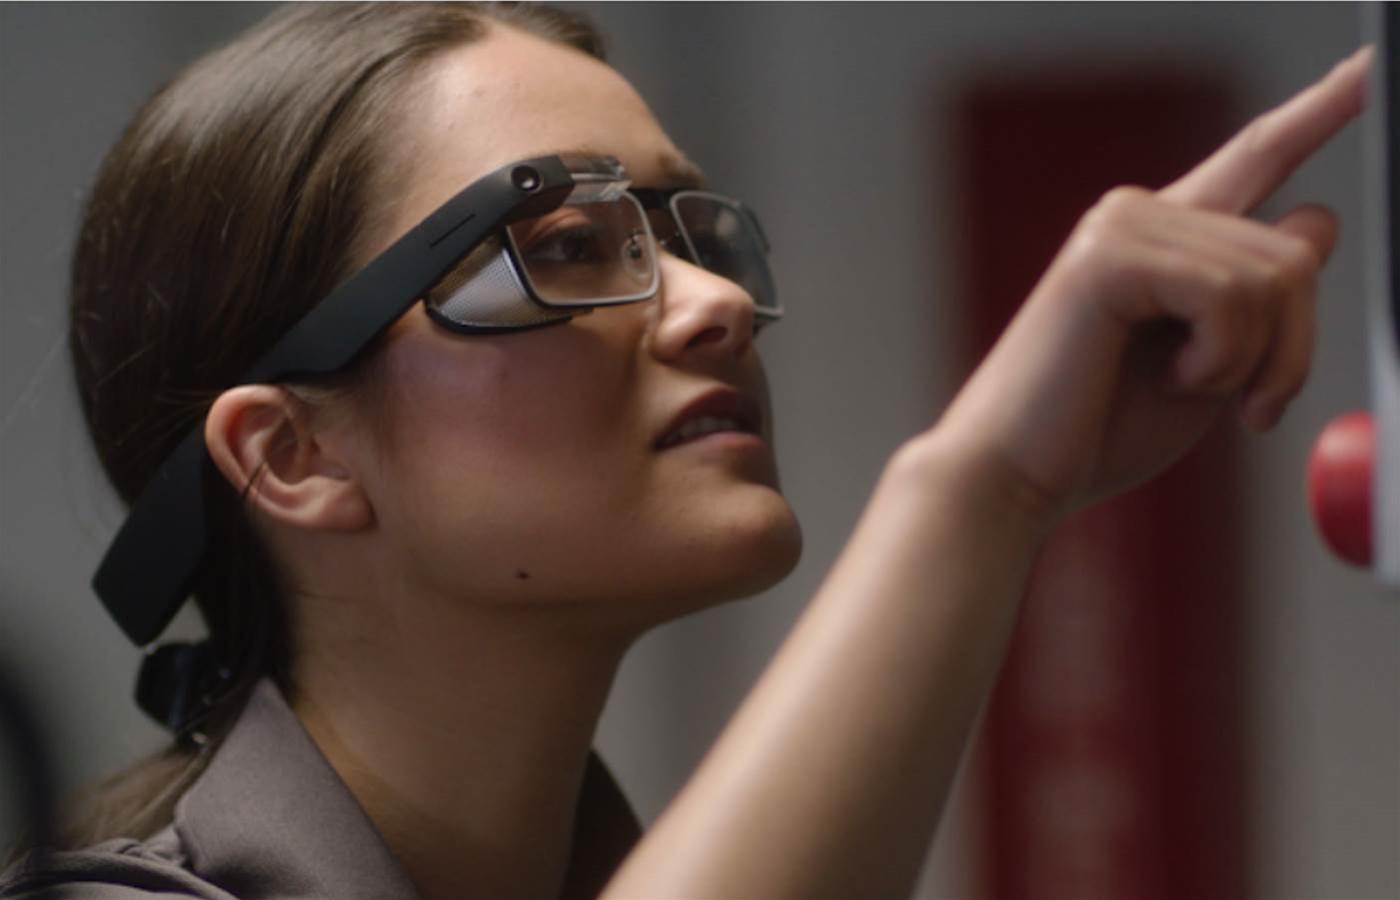 Google's only Australian Glass partner welcomes version 2.0